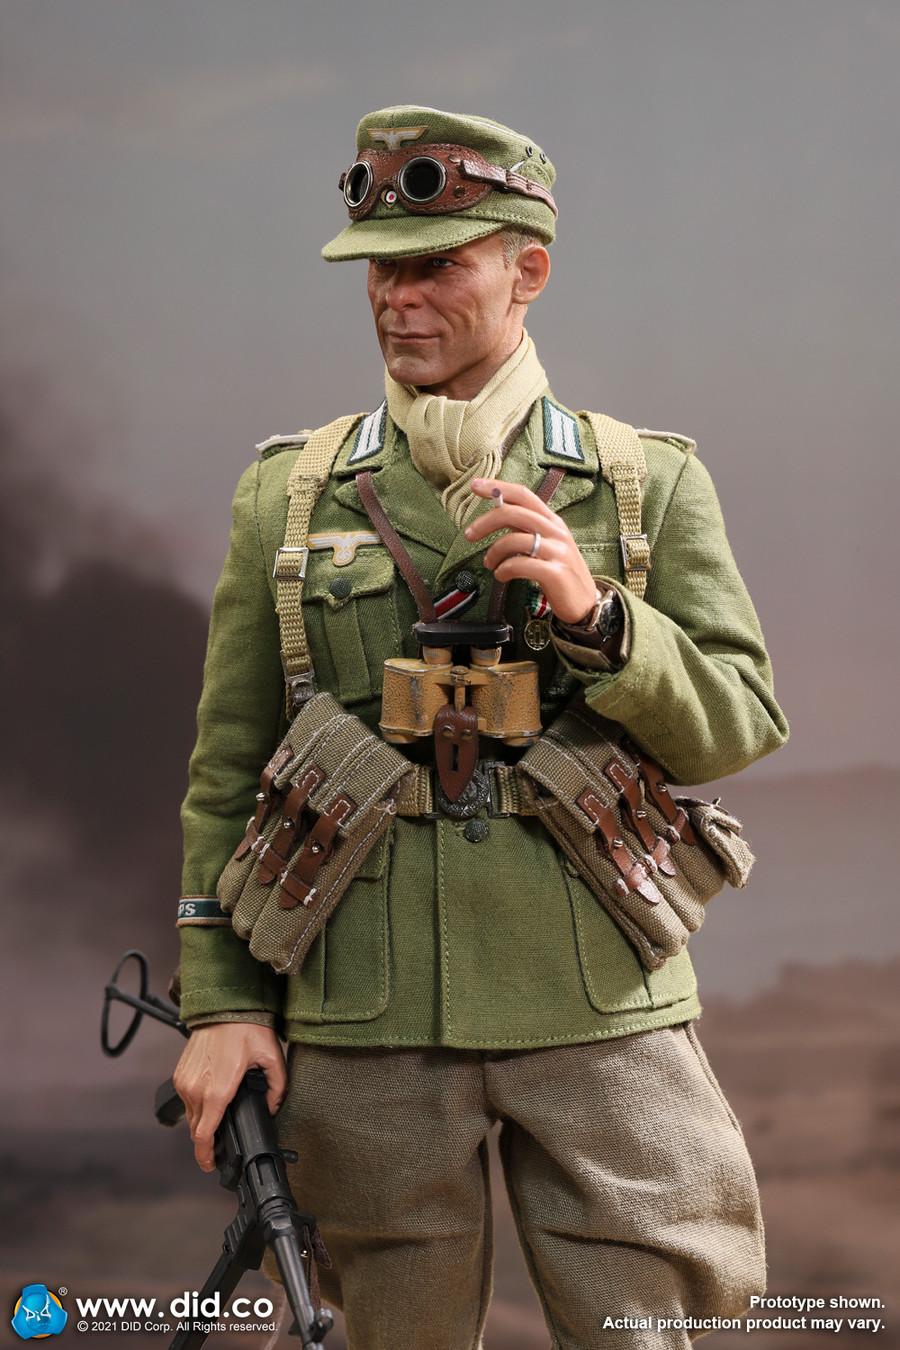 DID - WWII German Afrika Korps Infantry Captain – Wilhelm